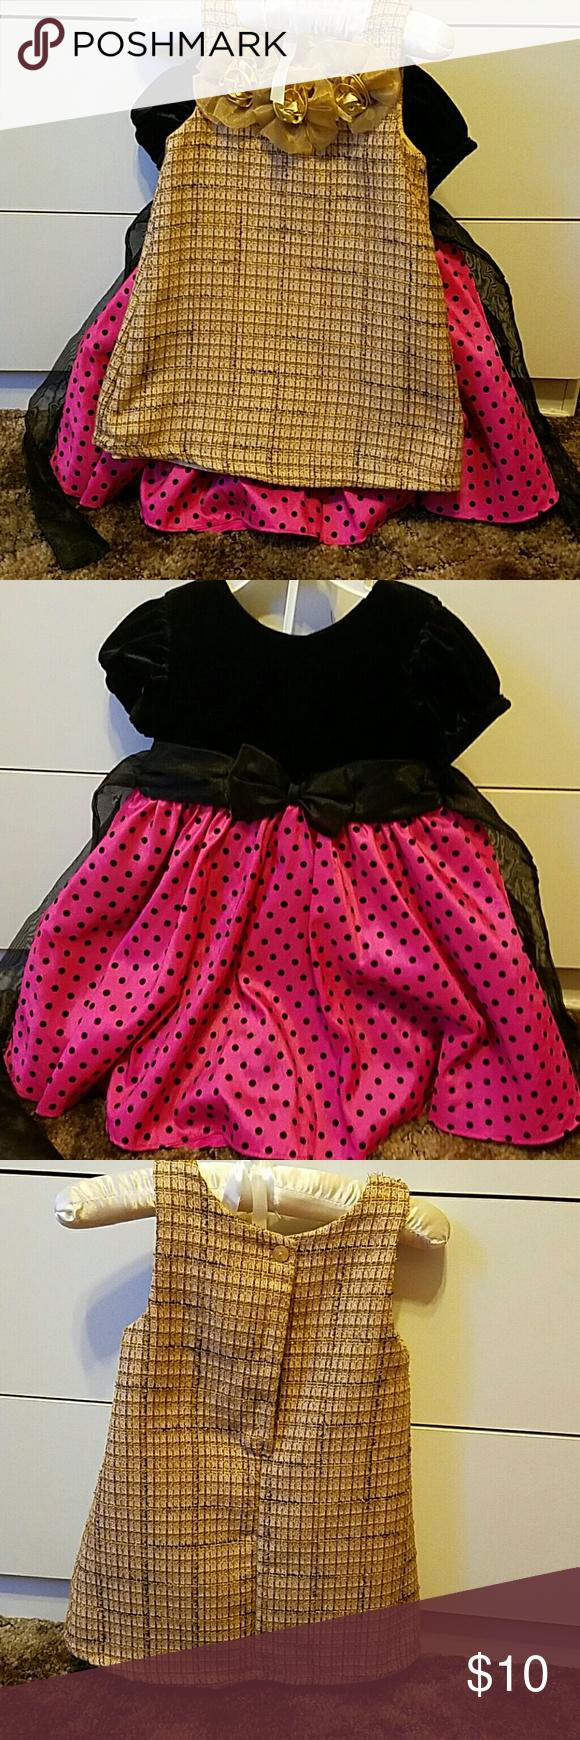 toddler girl dresses pink and black dress velvet top and gold